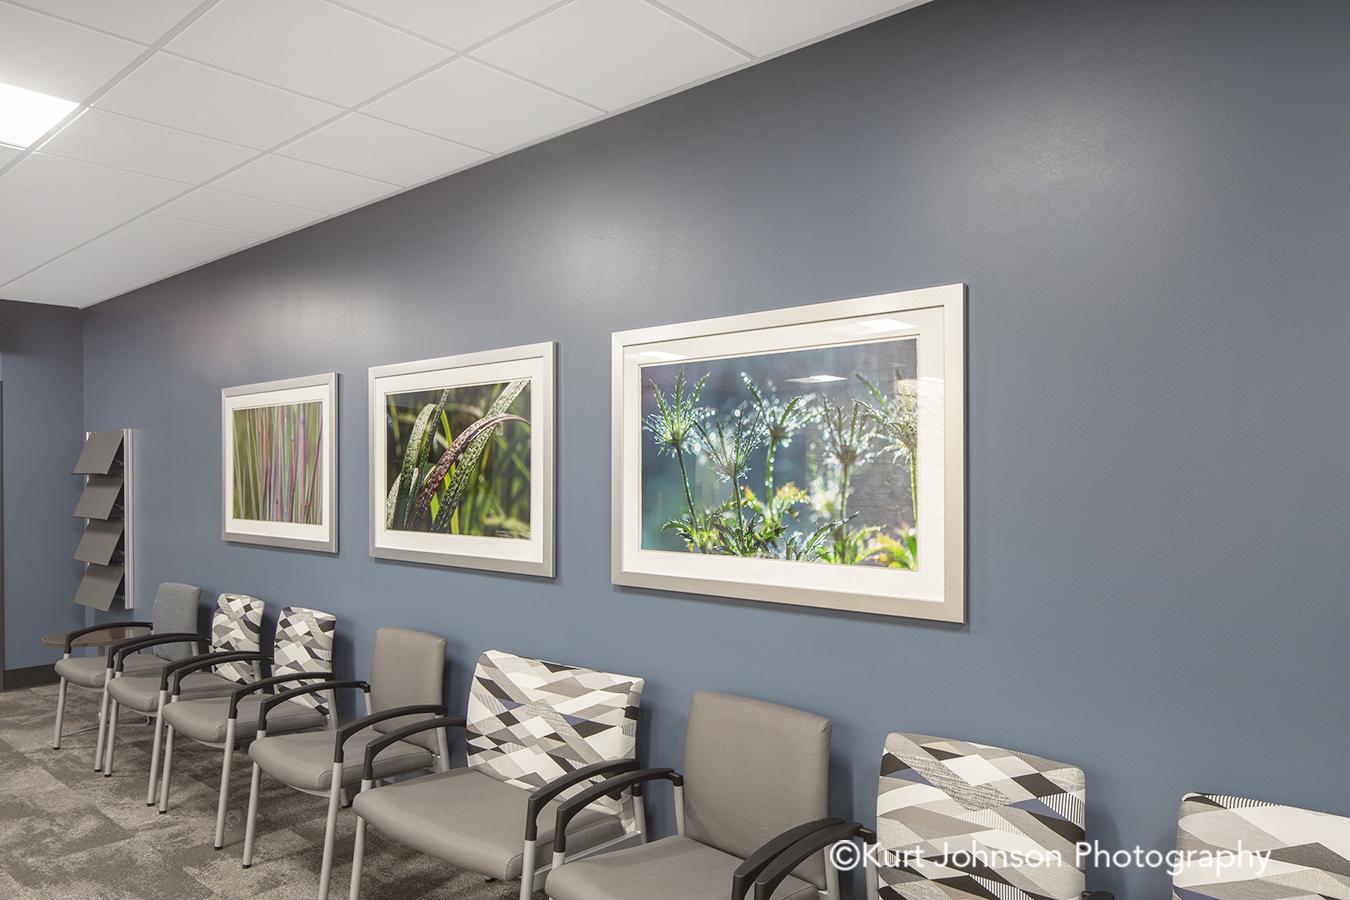 Methodist Jennie Edmundson Hospital Council Bluffs Iowa Framed Art Flower Botanical Healthcare Installation